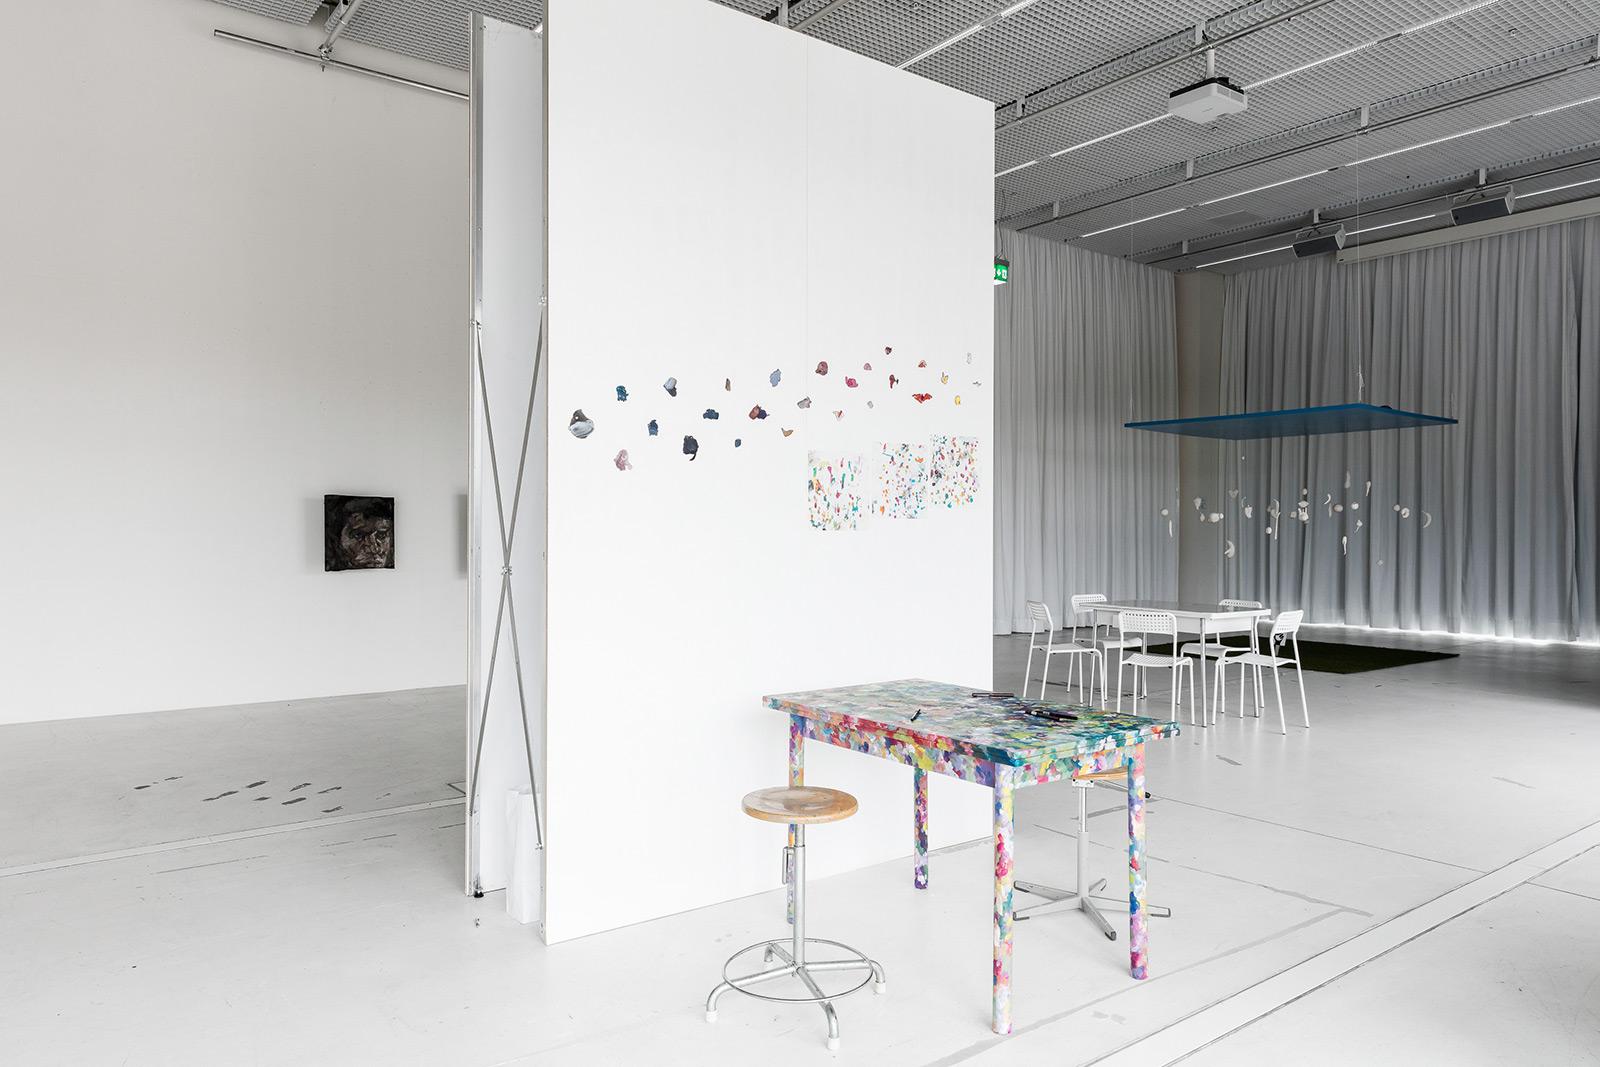 Sonja Käser «Erfleckte Freude» | LGK Lehrberufe für Gestaltung und Kunst, Diplom 2016